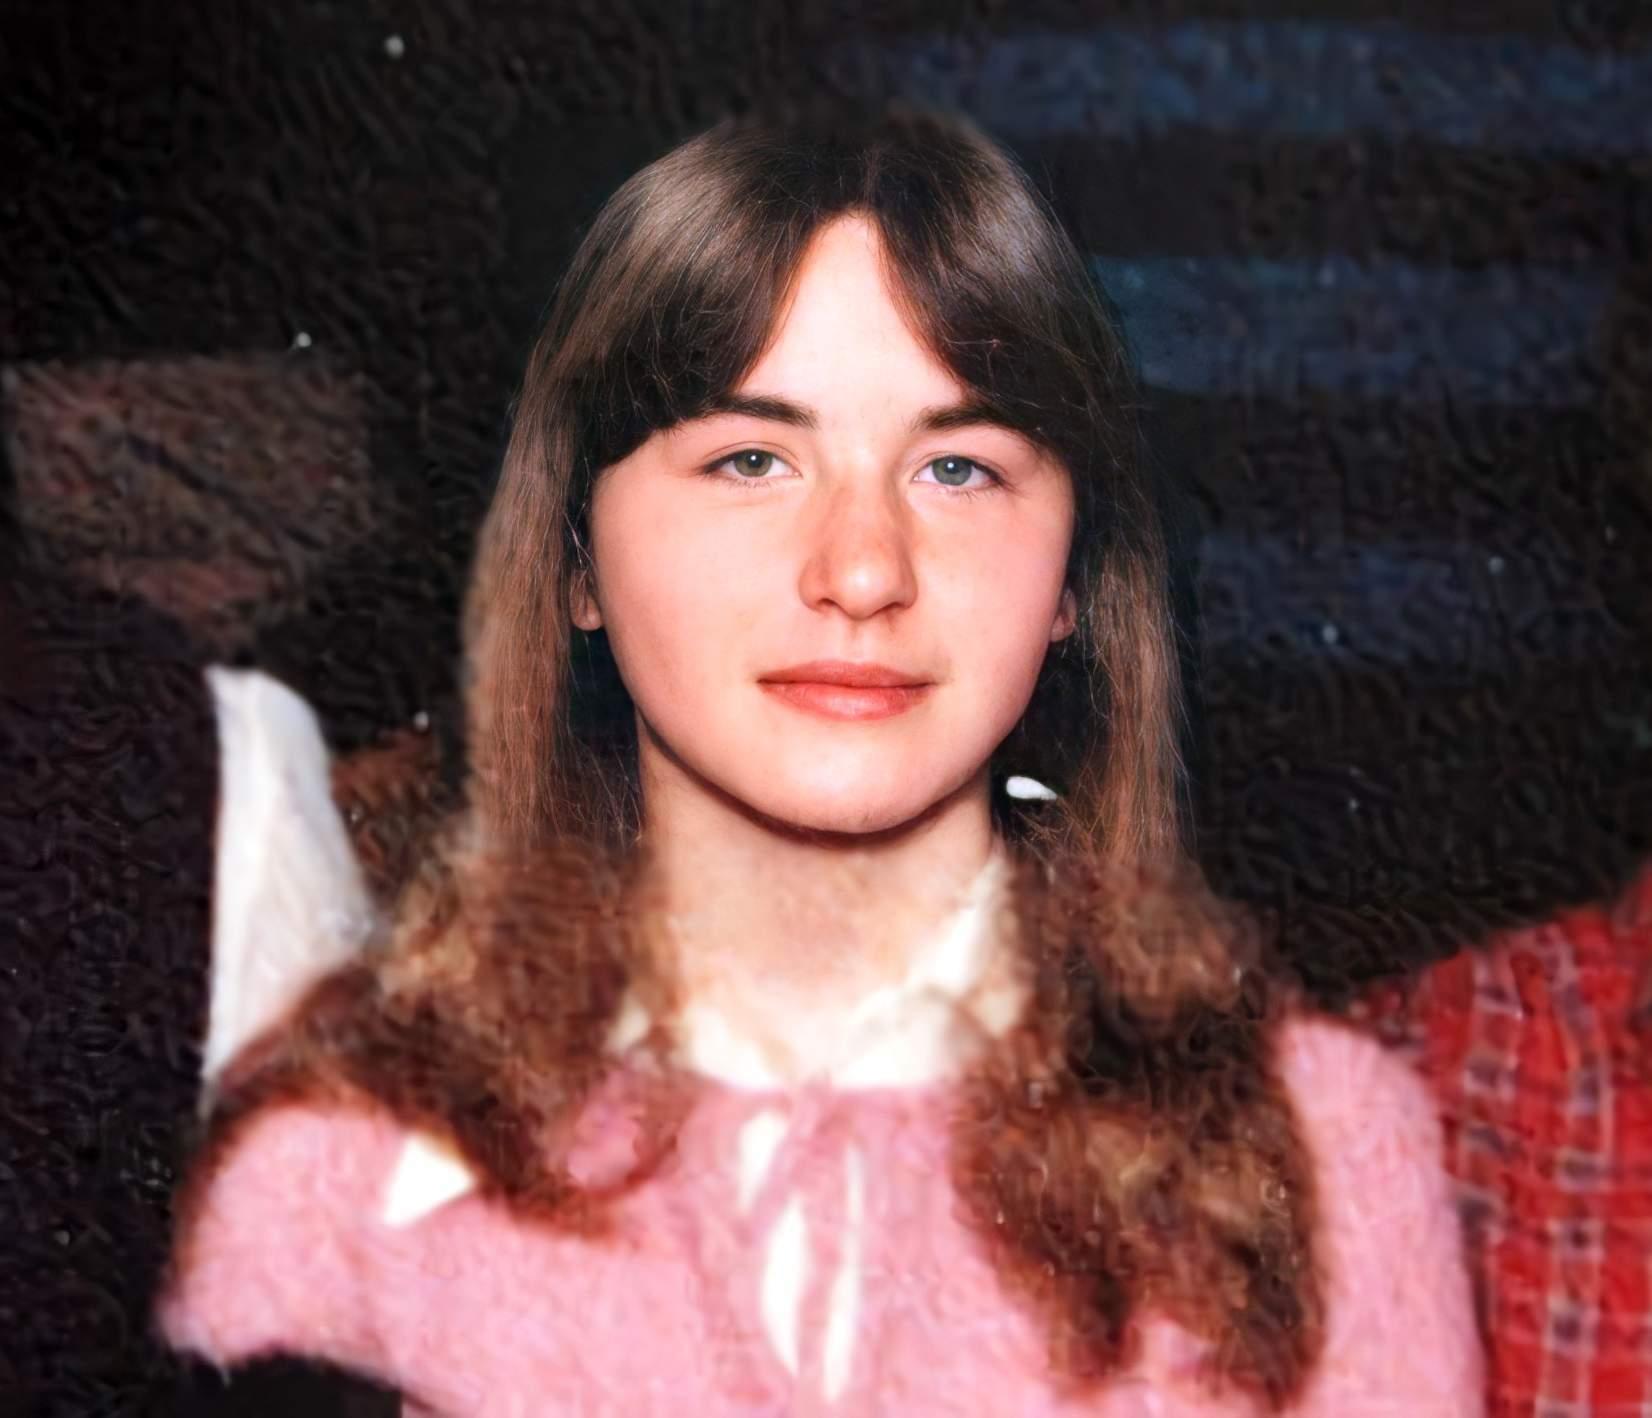 """I was born for rape"" ― Elisabeth Fritzl and his pedophile dad Josef Fritzl 1"